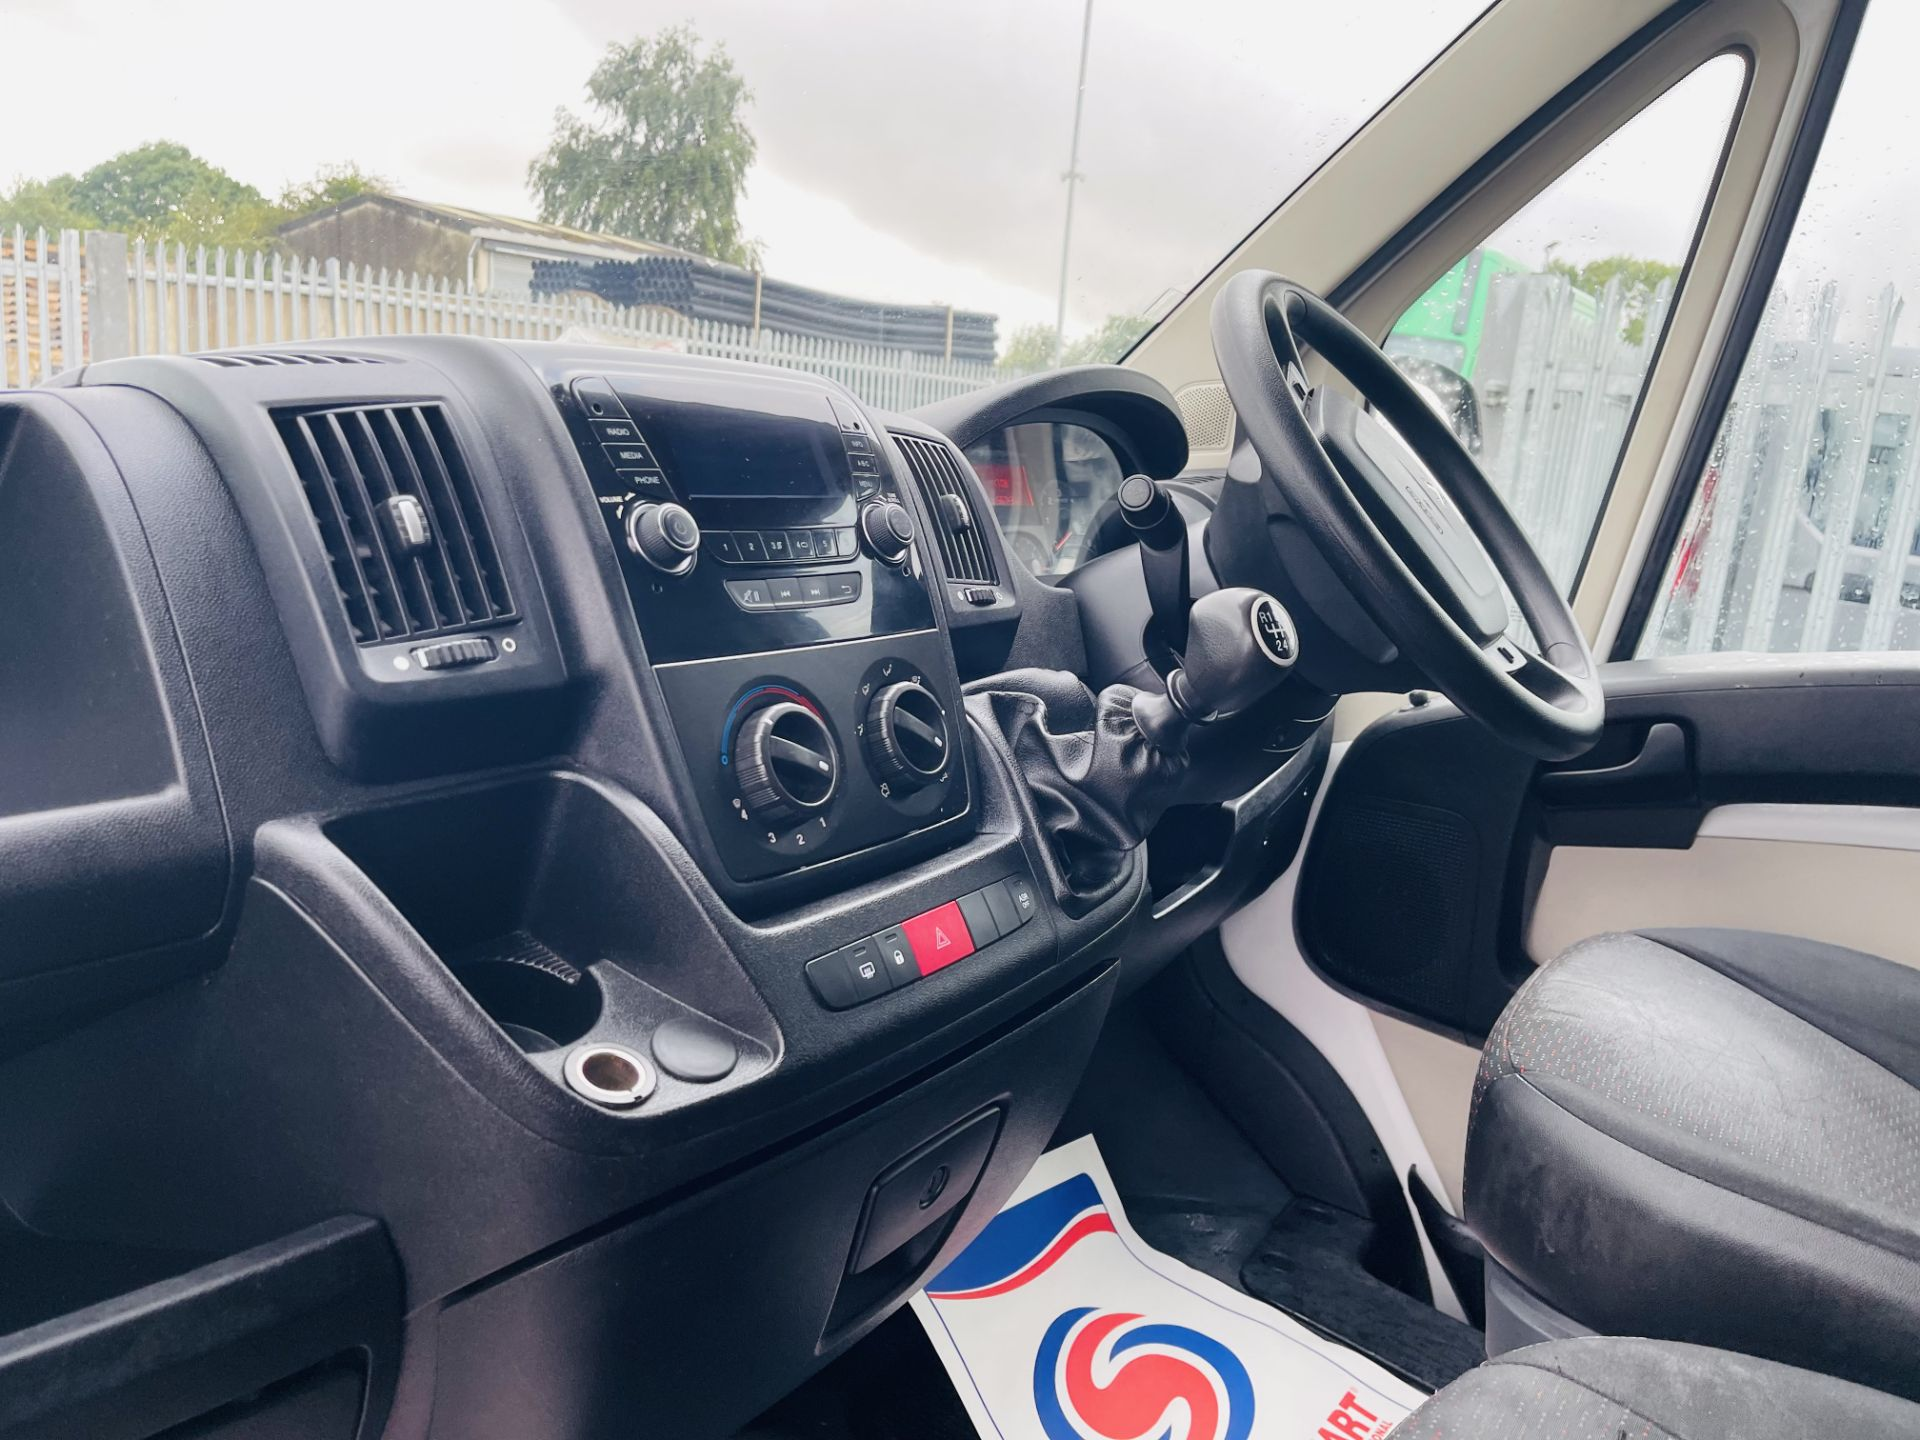 ** ON SALE ** Peugeot Boxer 2.0 BlueHDI L4 H3 2017 '66 Reg' Panel Van - LCV - Euro 6b ULEZ Compliant - Image 8 of 18